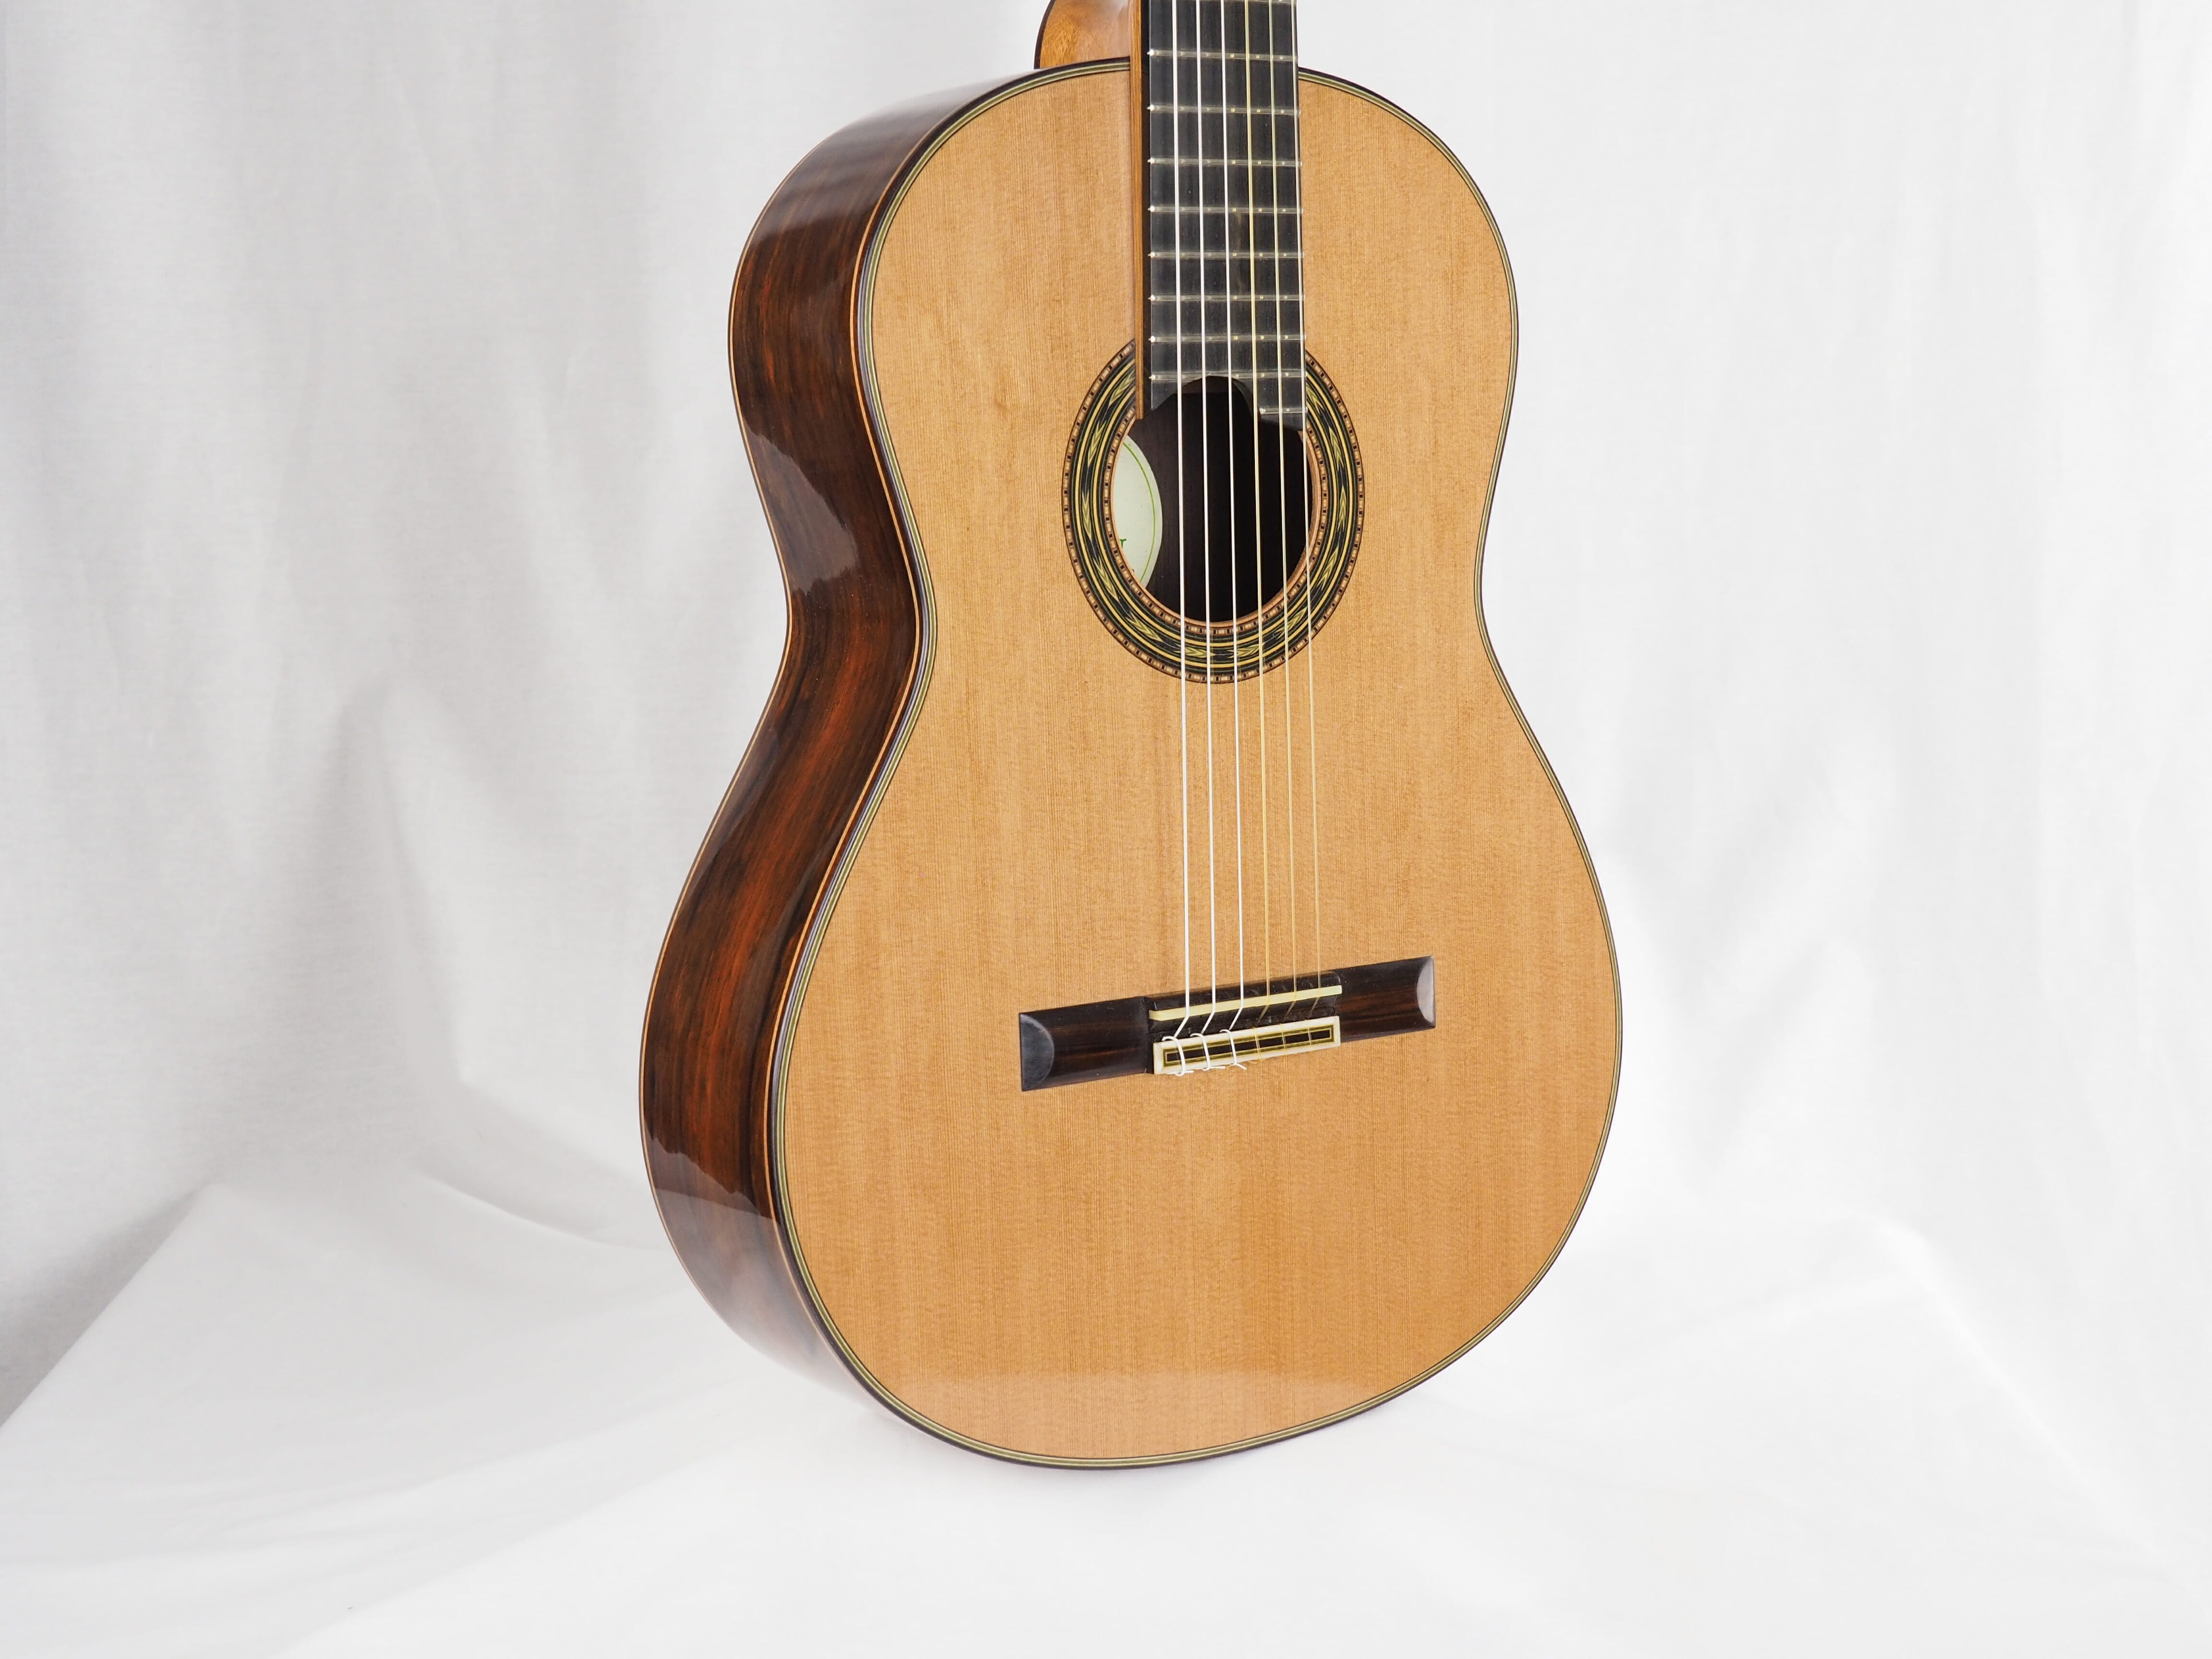 Luthier Keijo Korelin guitare classique double-table 17KOR093-05